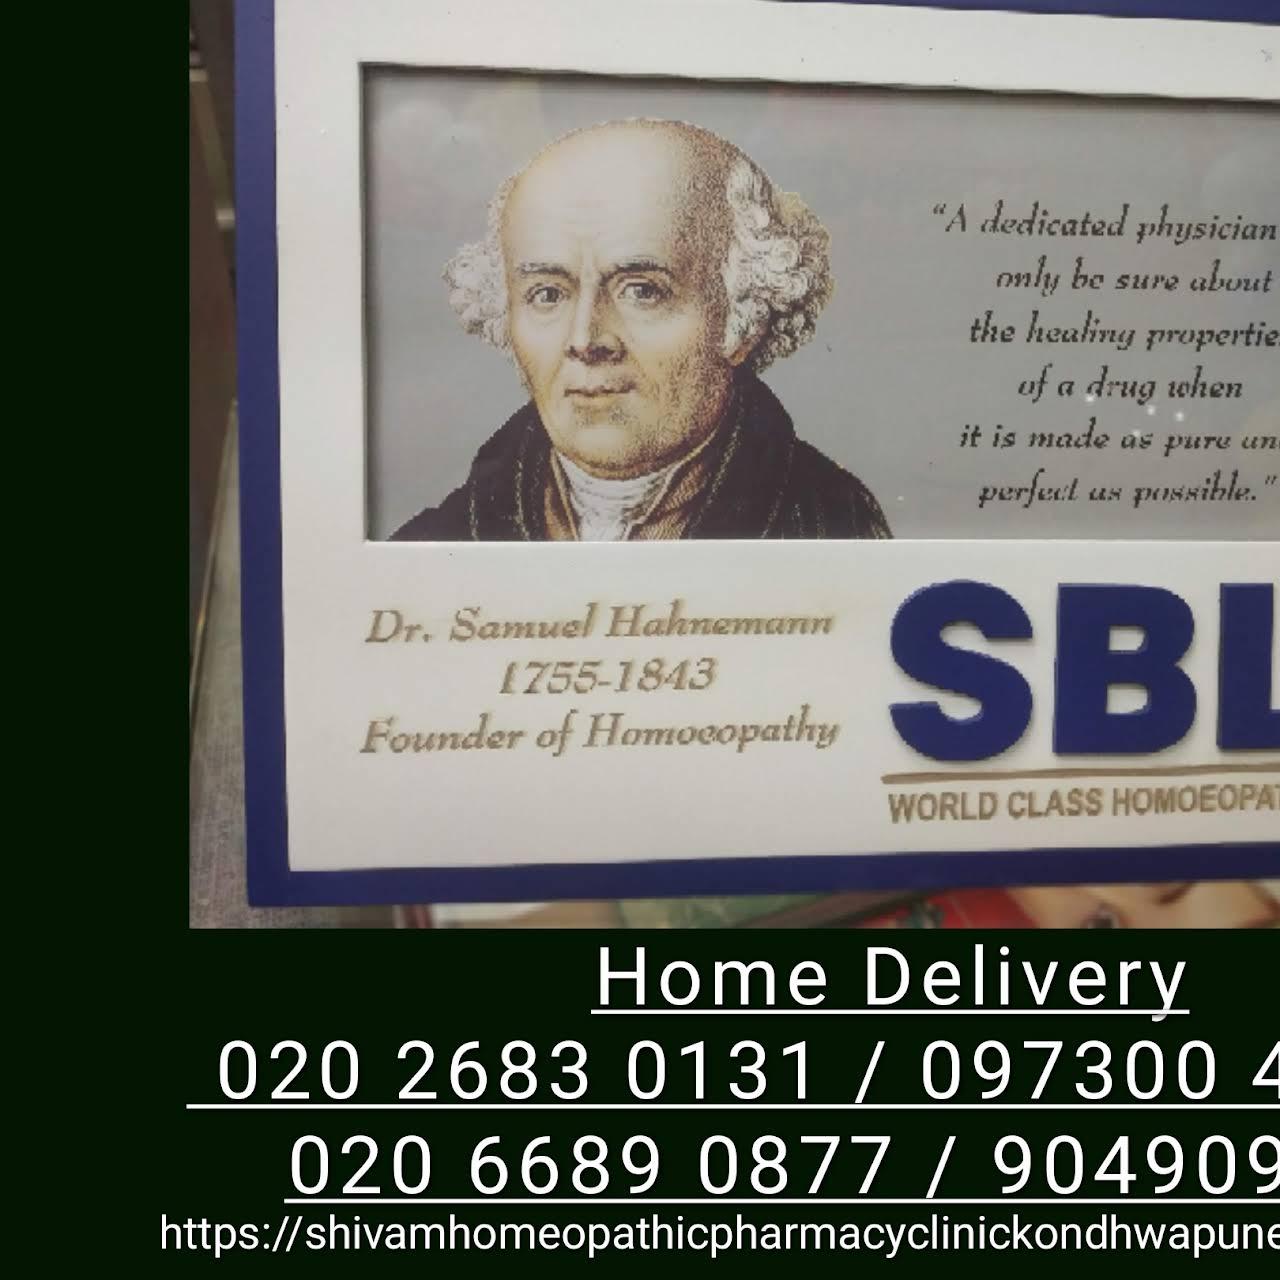 Shivam Homeopathic Pharmacy | Homeopathy Doctor in Pune